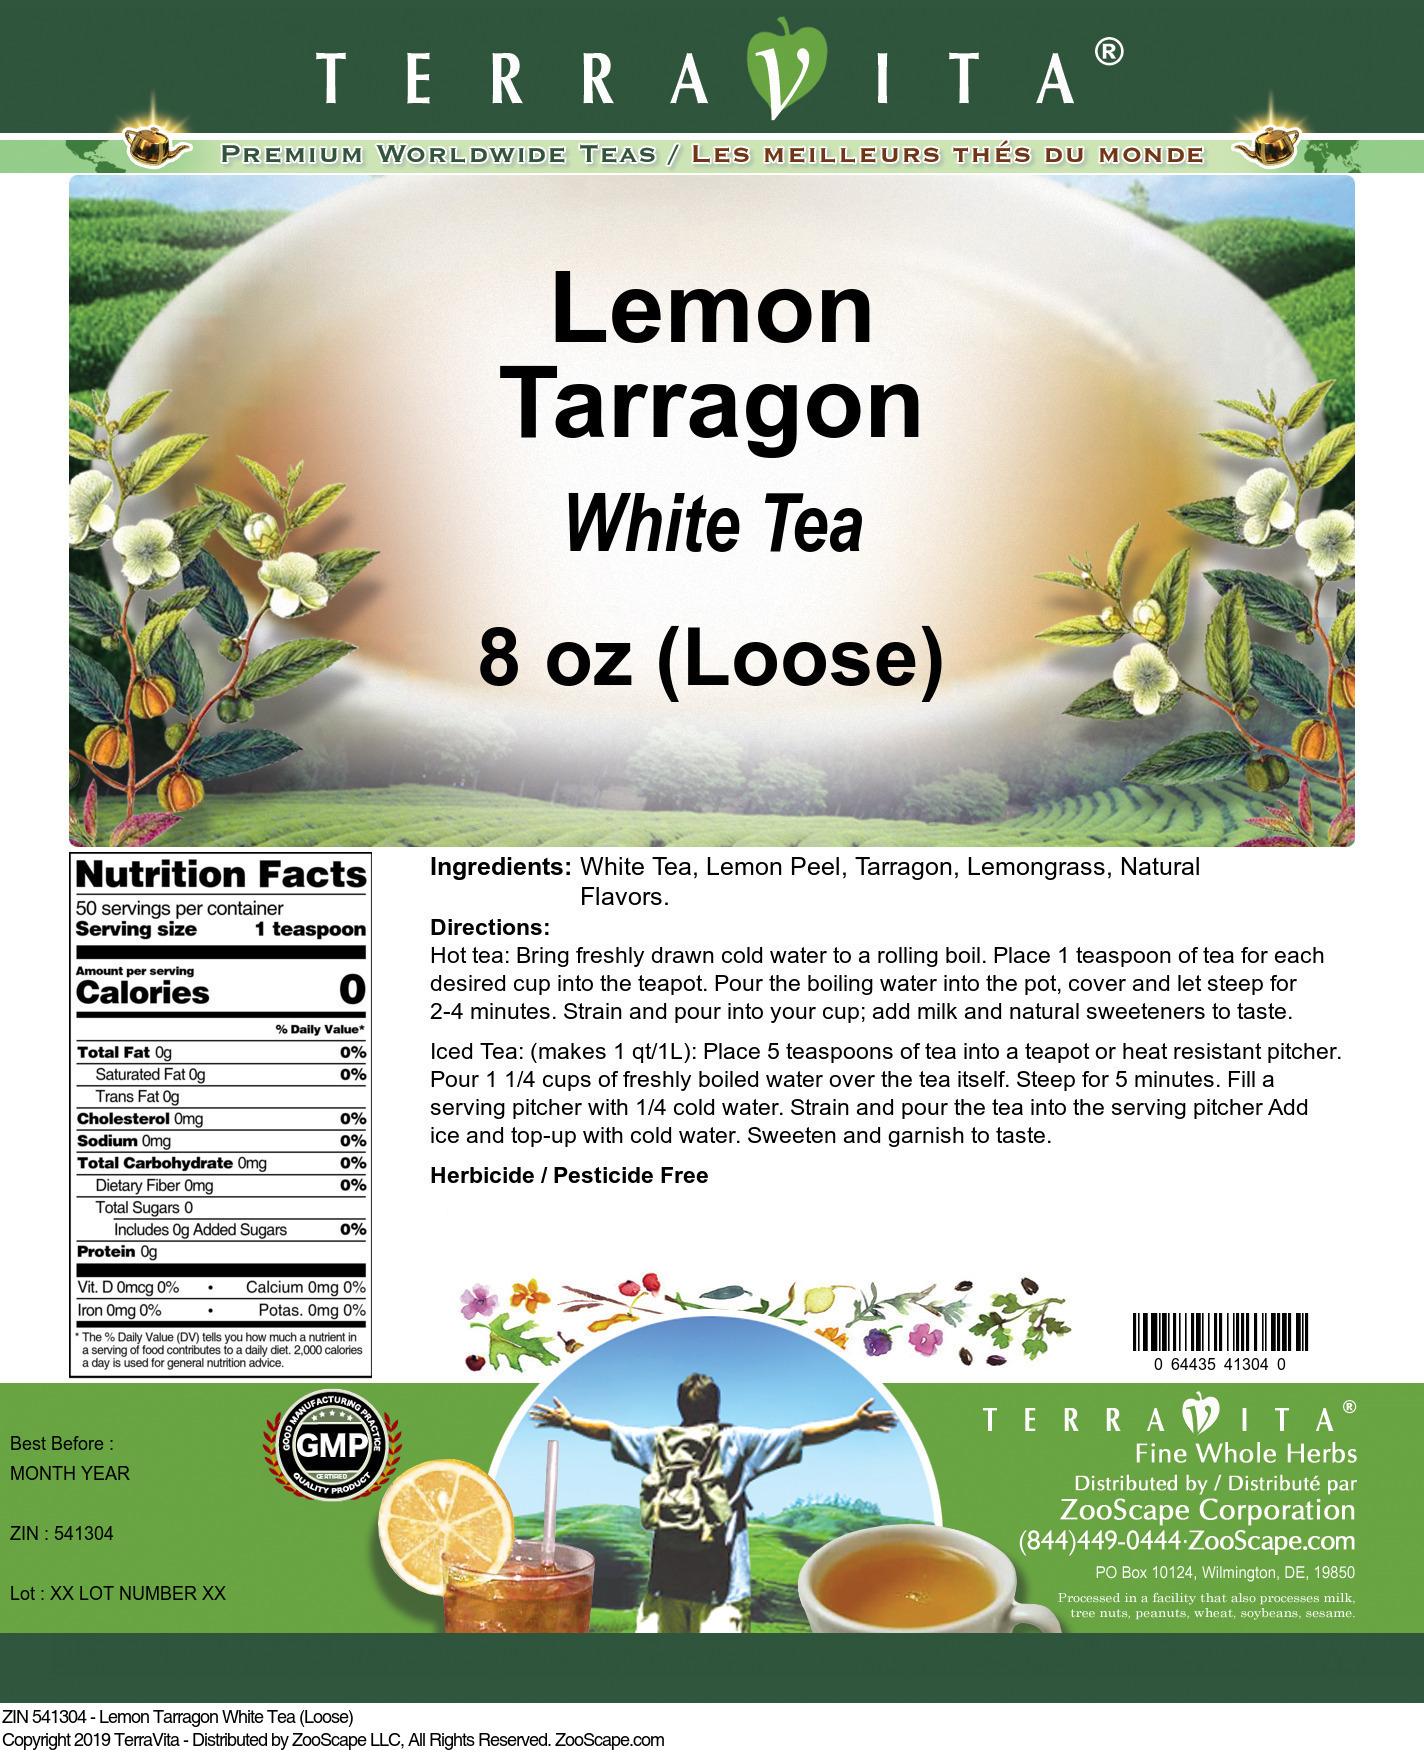 Lemon Tarragon White Tea (Loose)